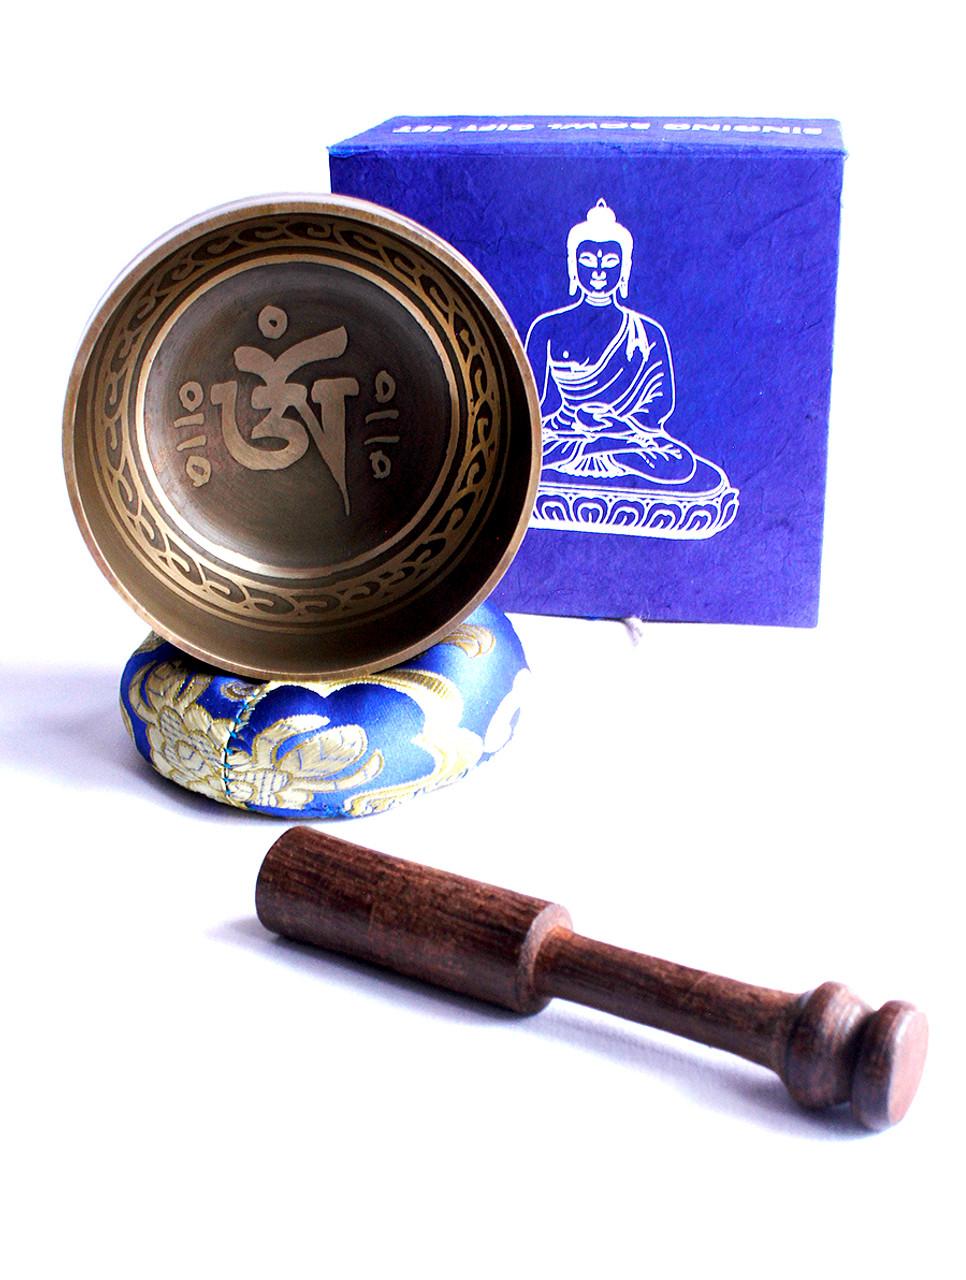 Small tibetan singing bowl